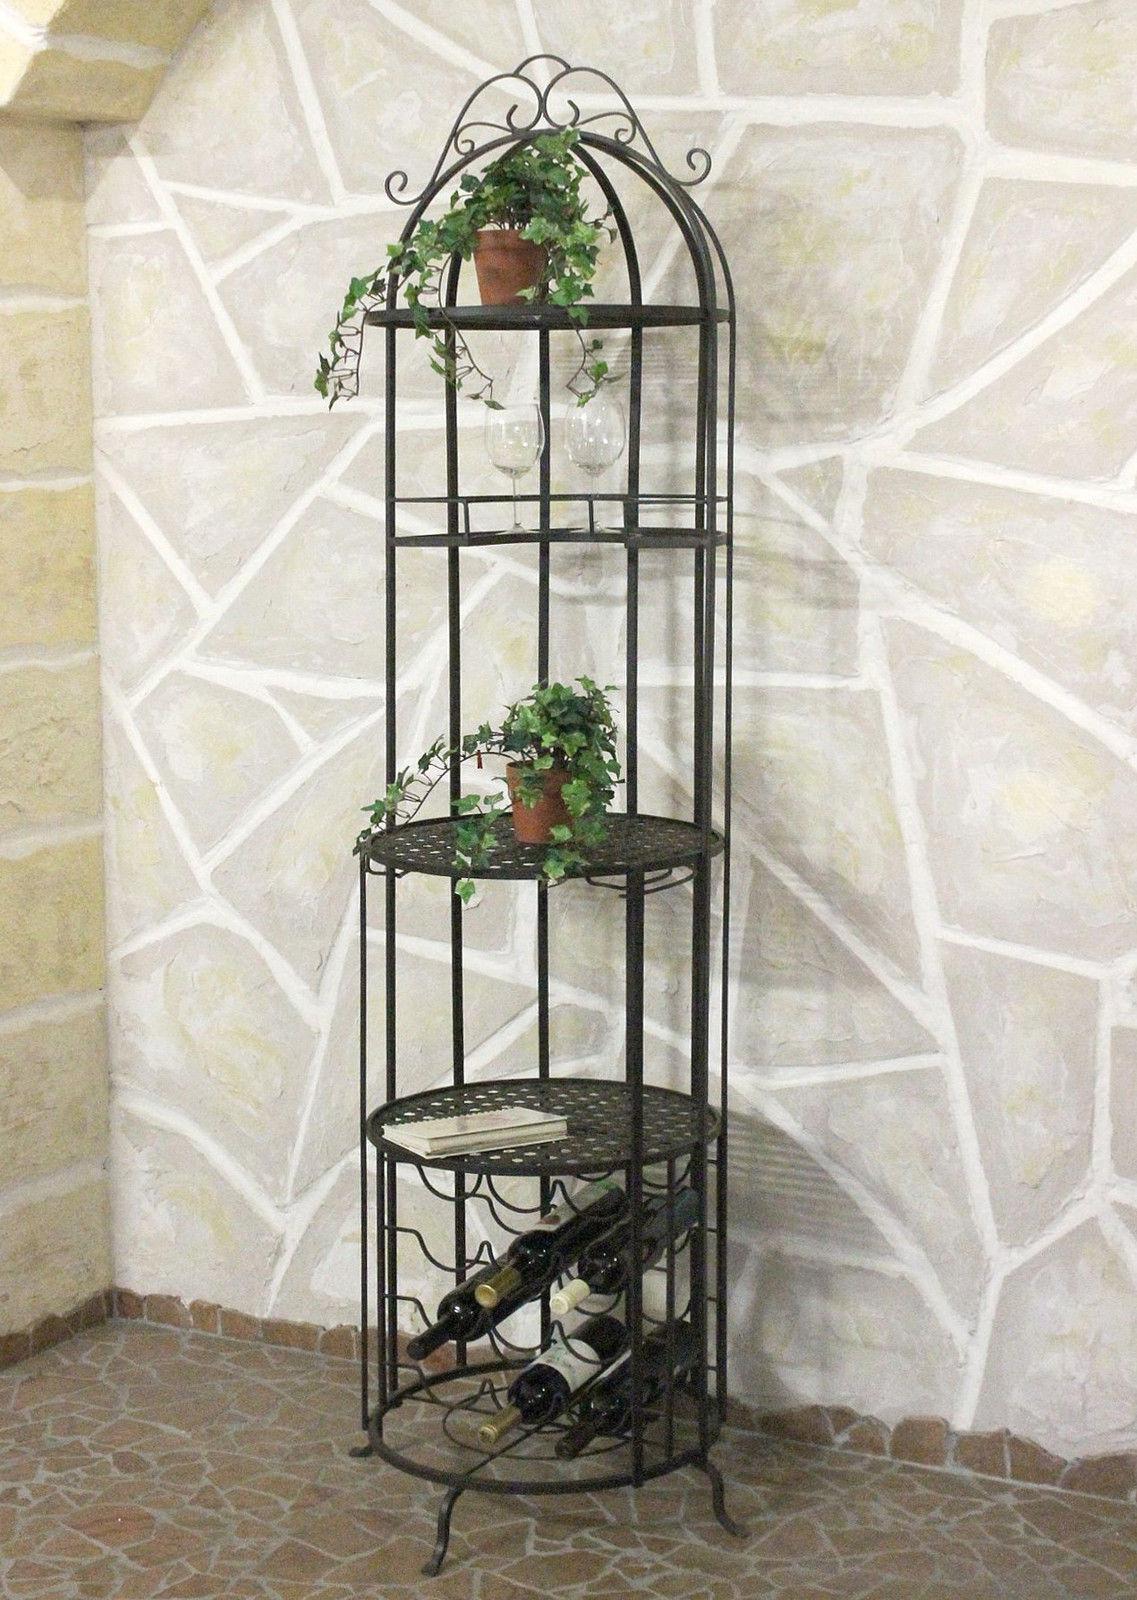 weinregal bar k fig aus metall 196 cm hausbar 130067 flaschenhalter weinschrank ebay. Black Bedroom Furniture Sets. Home Design Ideas